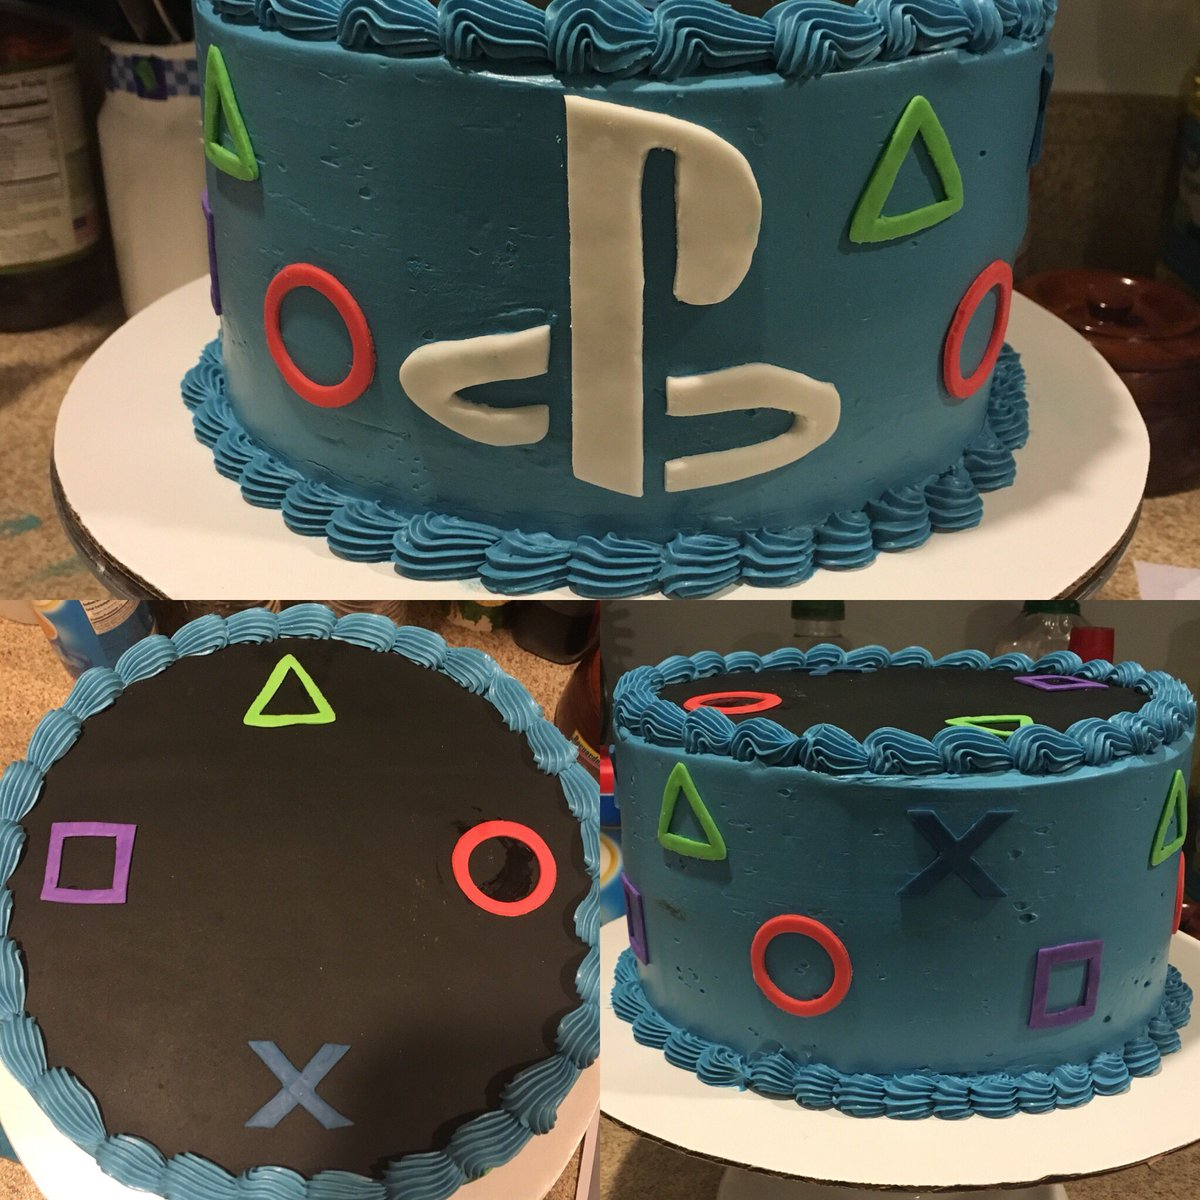 Gabs On Twitter My PlayStation Cake Playstation4 Sony Playstation Swissbuttercream Fondant Bakingandpastry